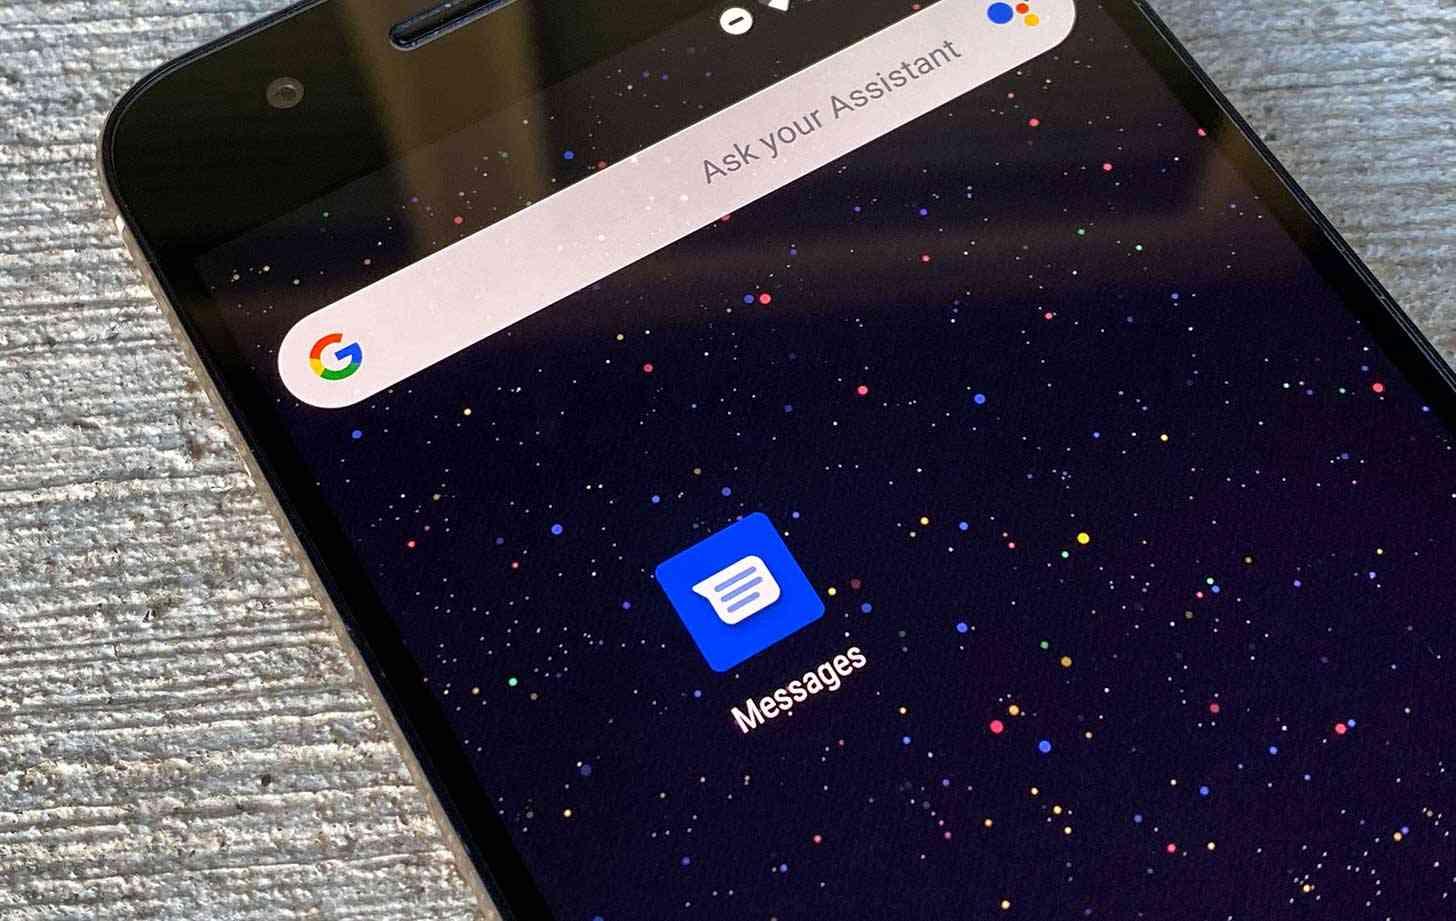 Google Messages app